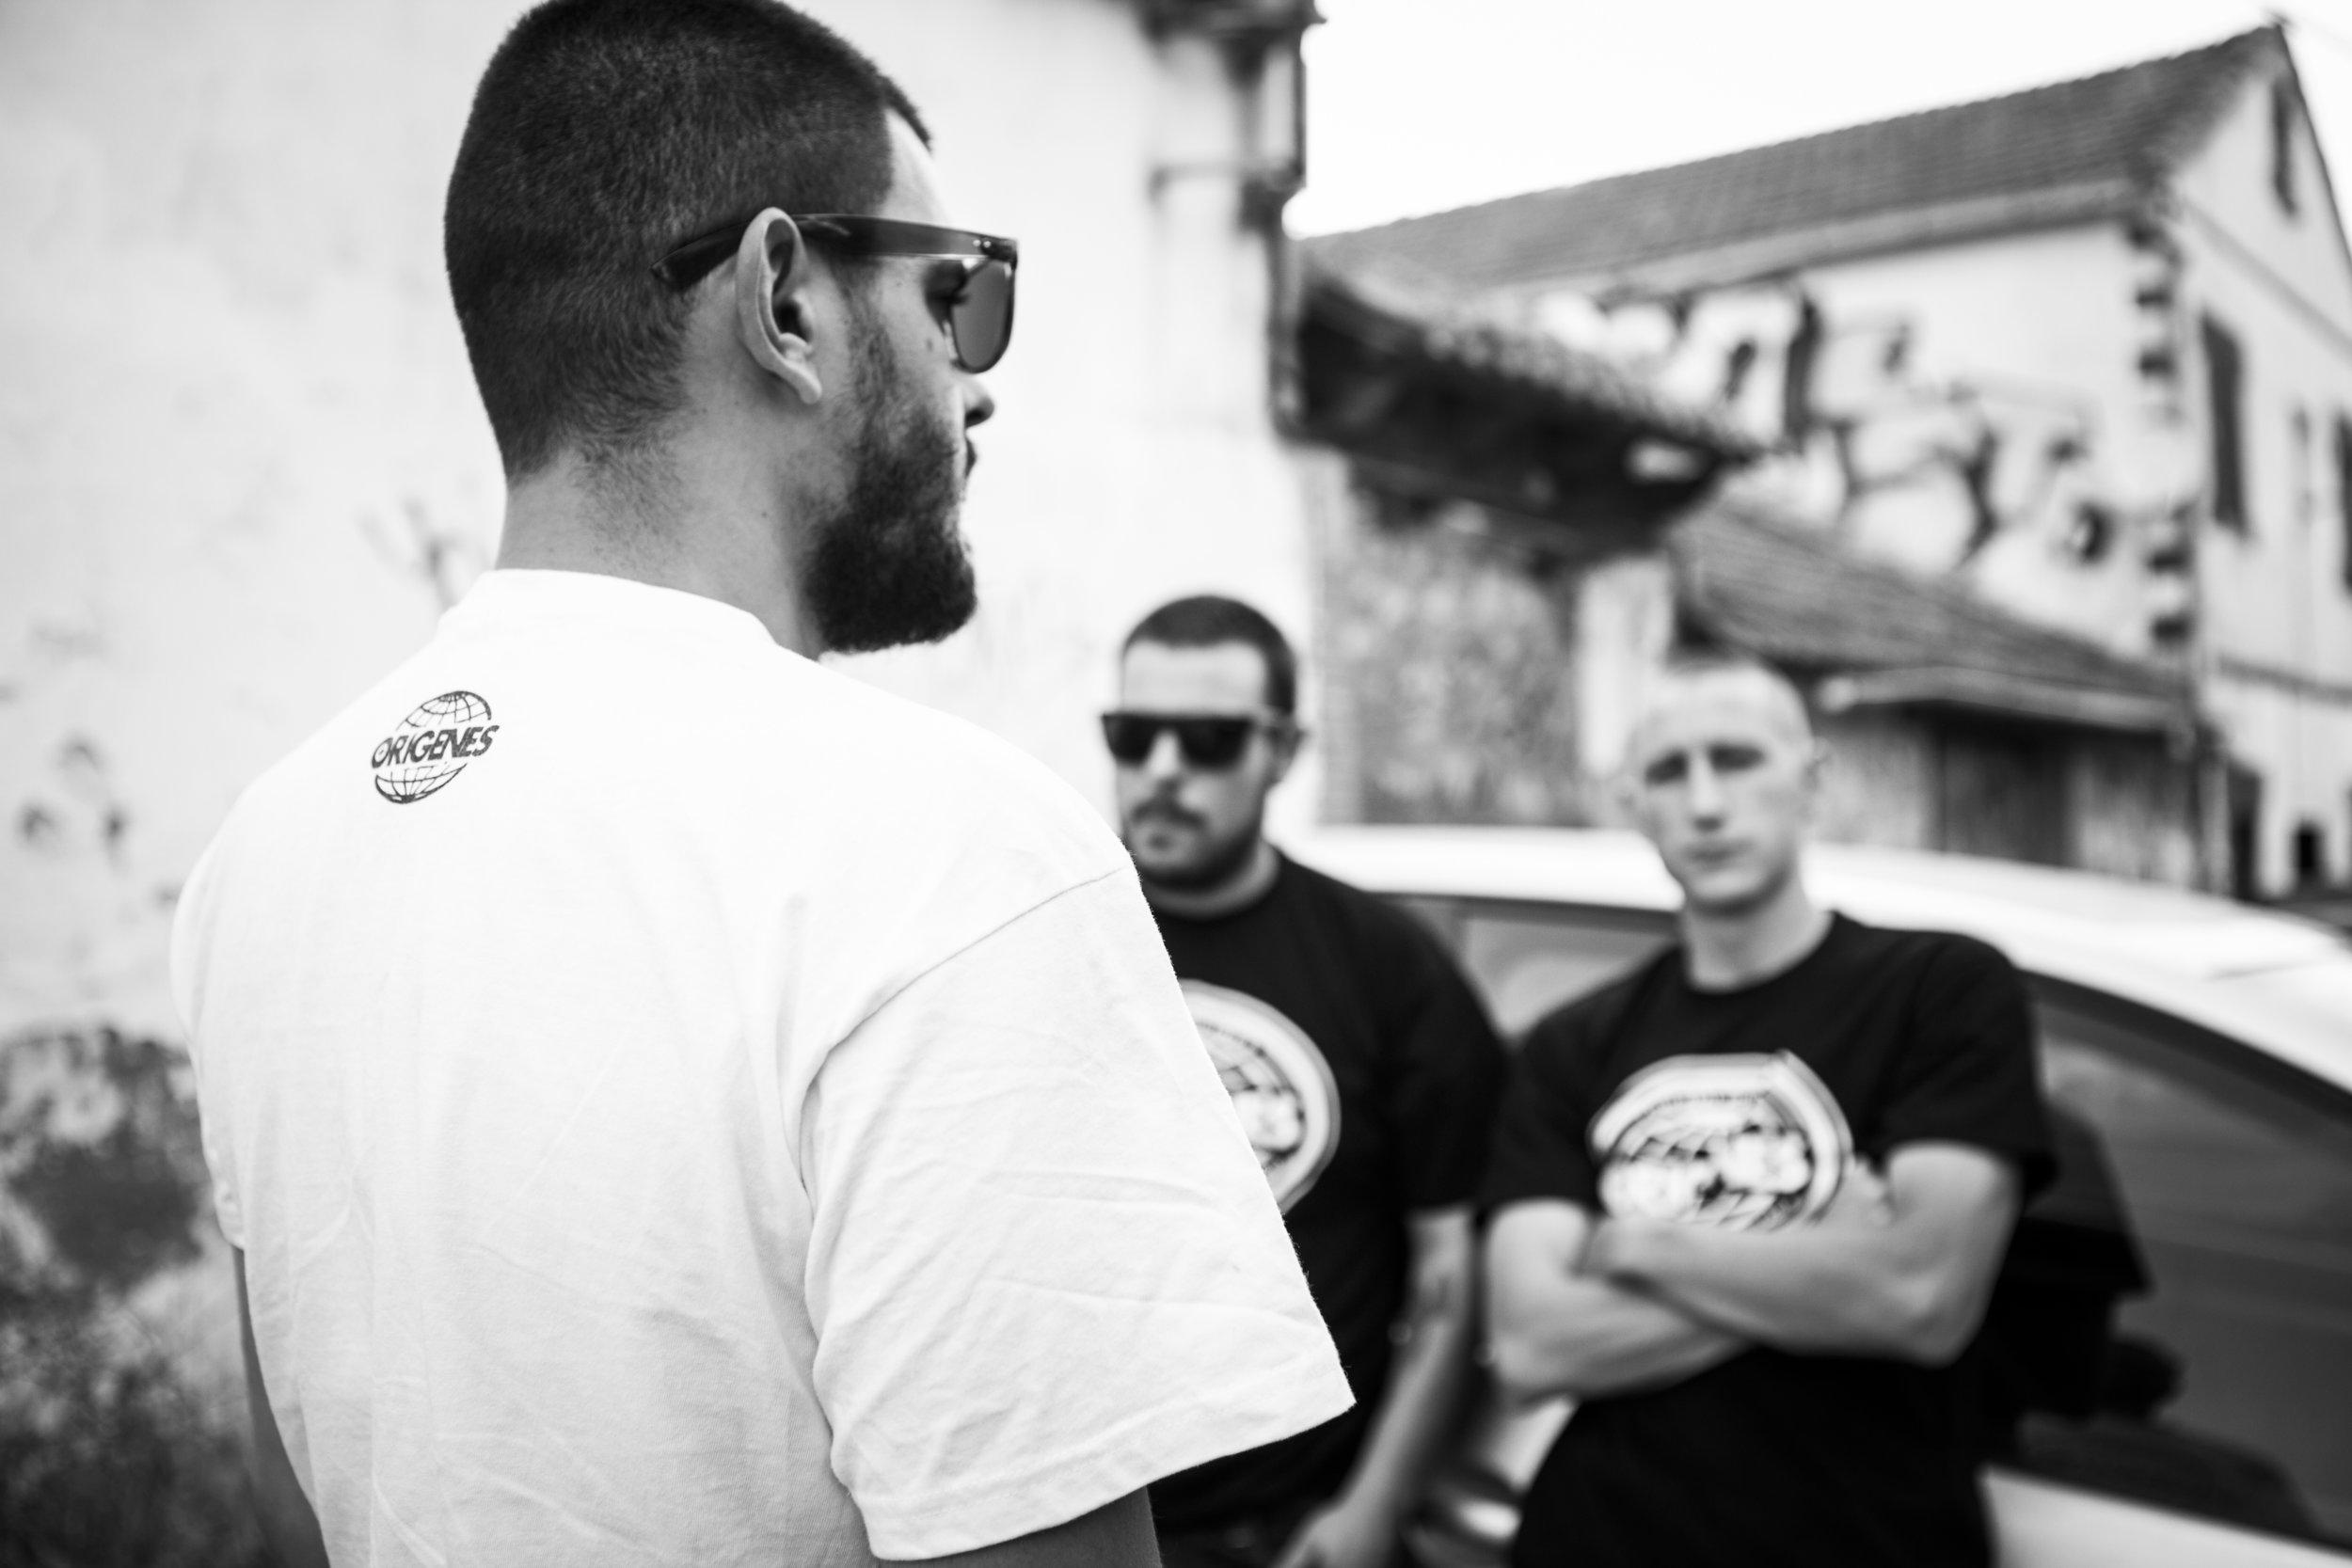 Oscar-arribas-photography-fotografo-reportaje-origenes-rap-hiphop-hip-hop-burgos-victor-rutty-viti-hurto-rober-rel-pyro-djkaef-kaef-thelouk-the-louk-portrait-retrato-editorial-music-band-musicos-street-real-71.jpg